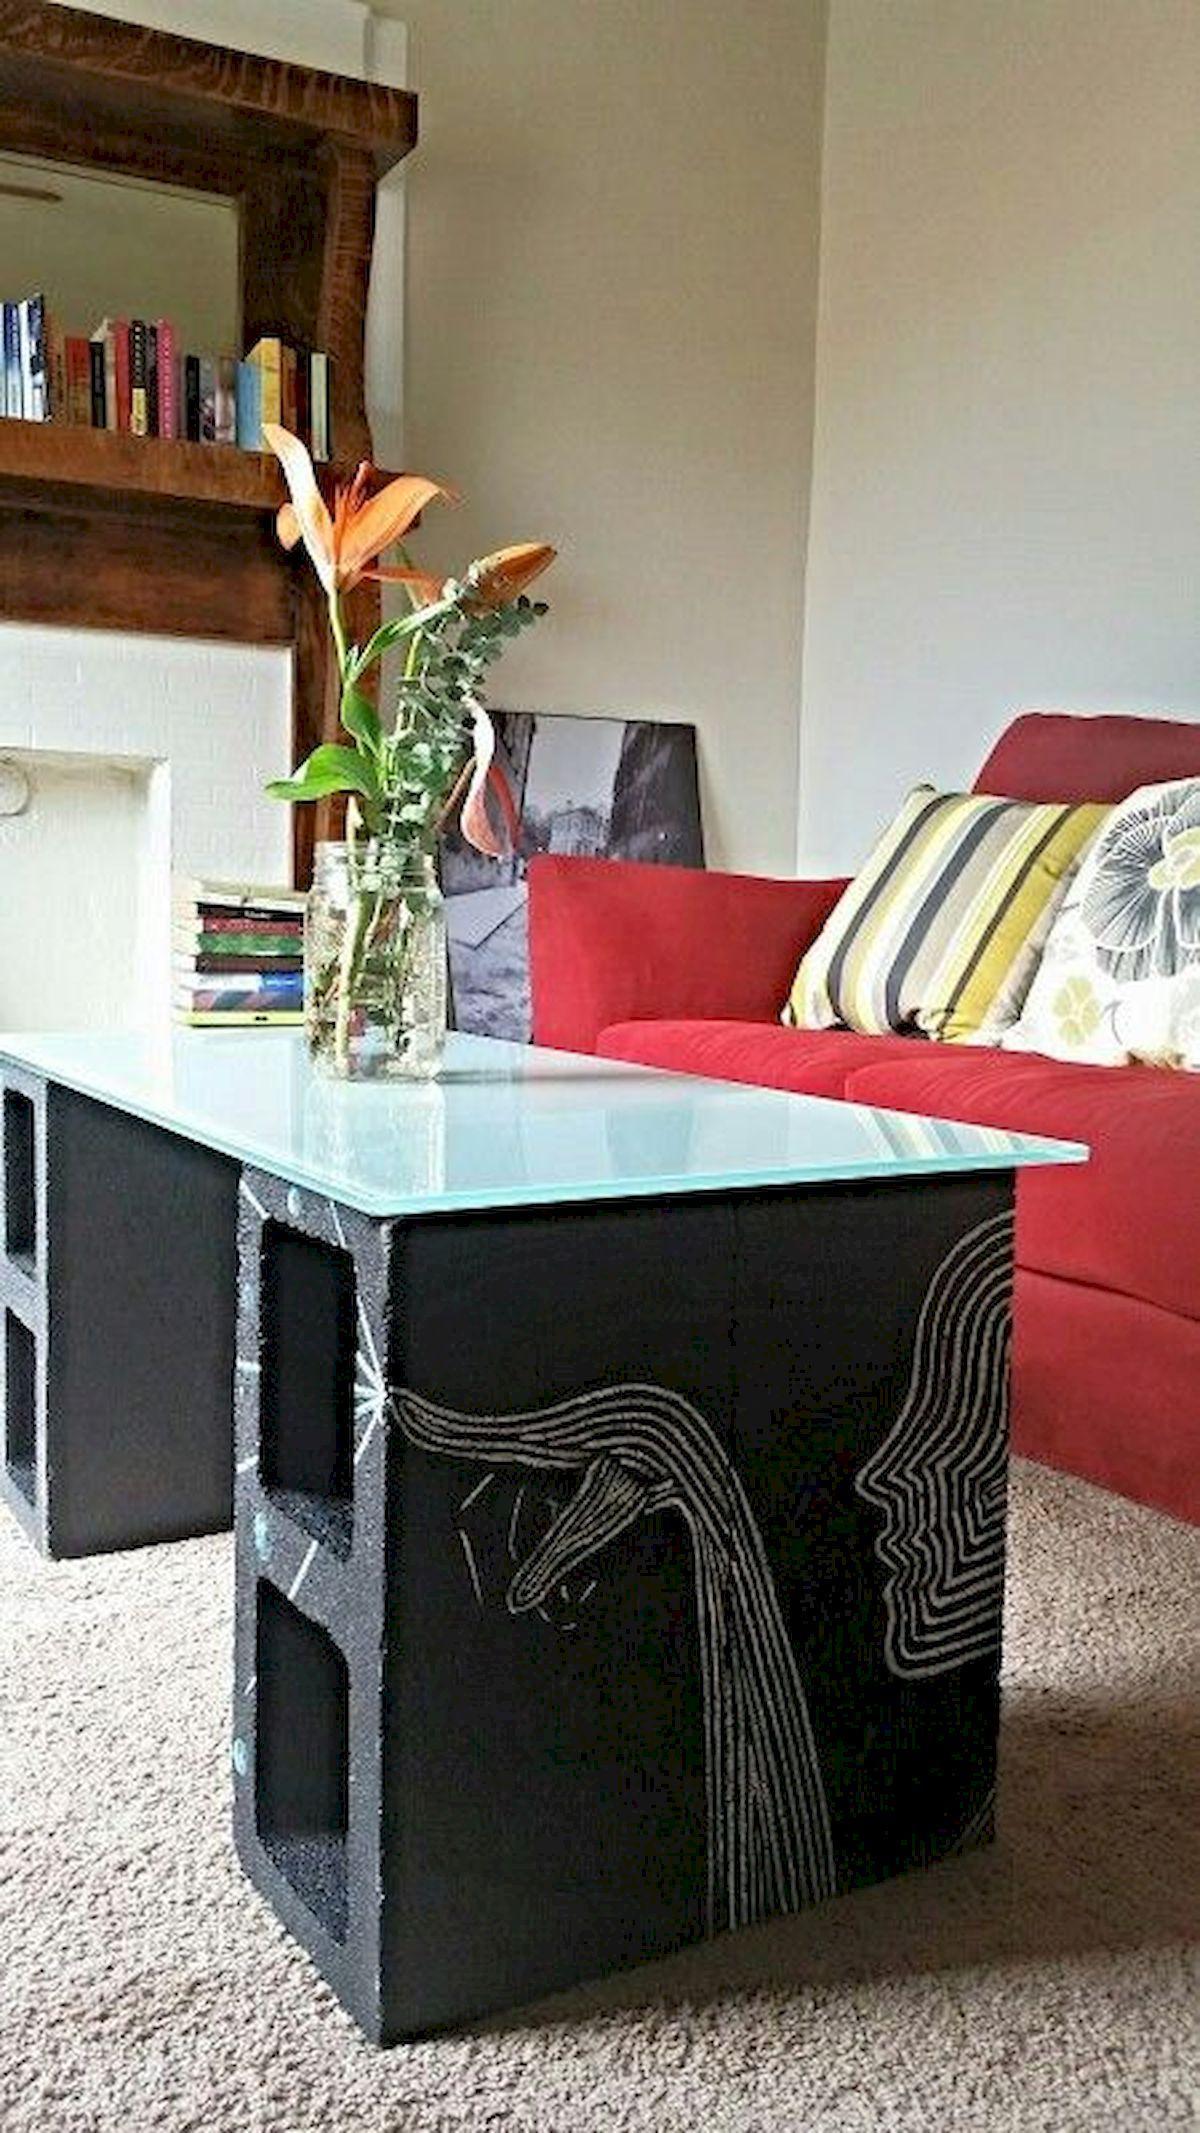 Diy Cinder Block Furniture Designs Cinder Block Furniture